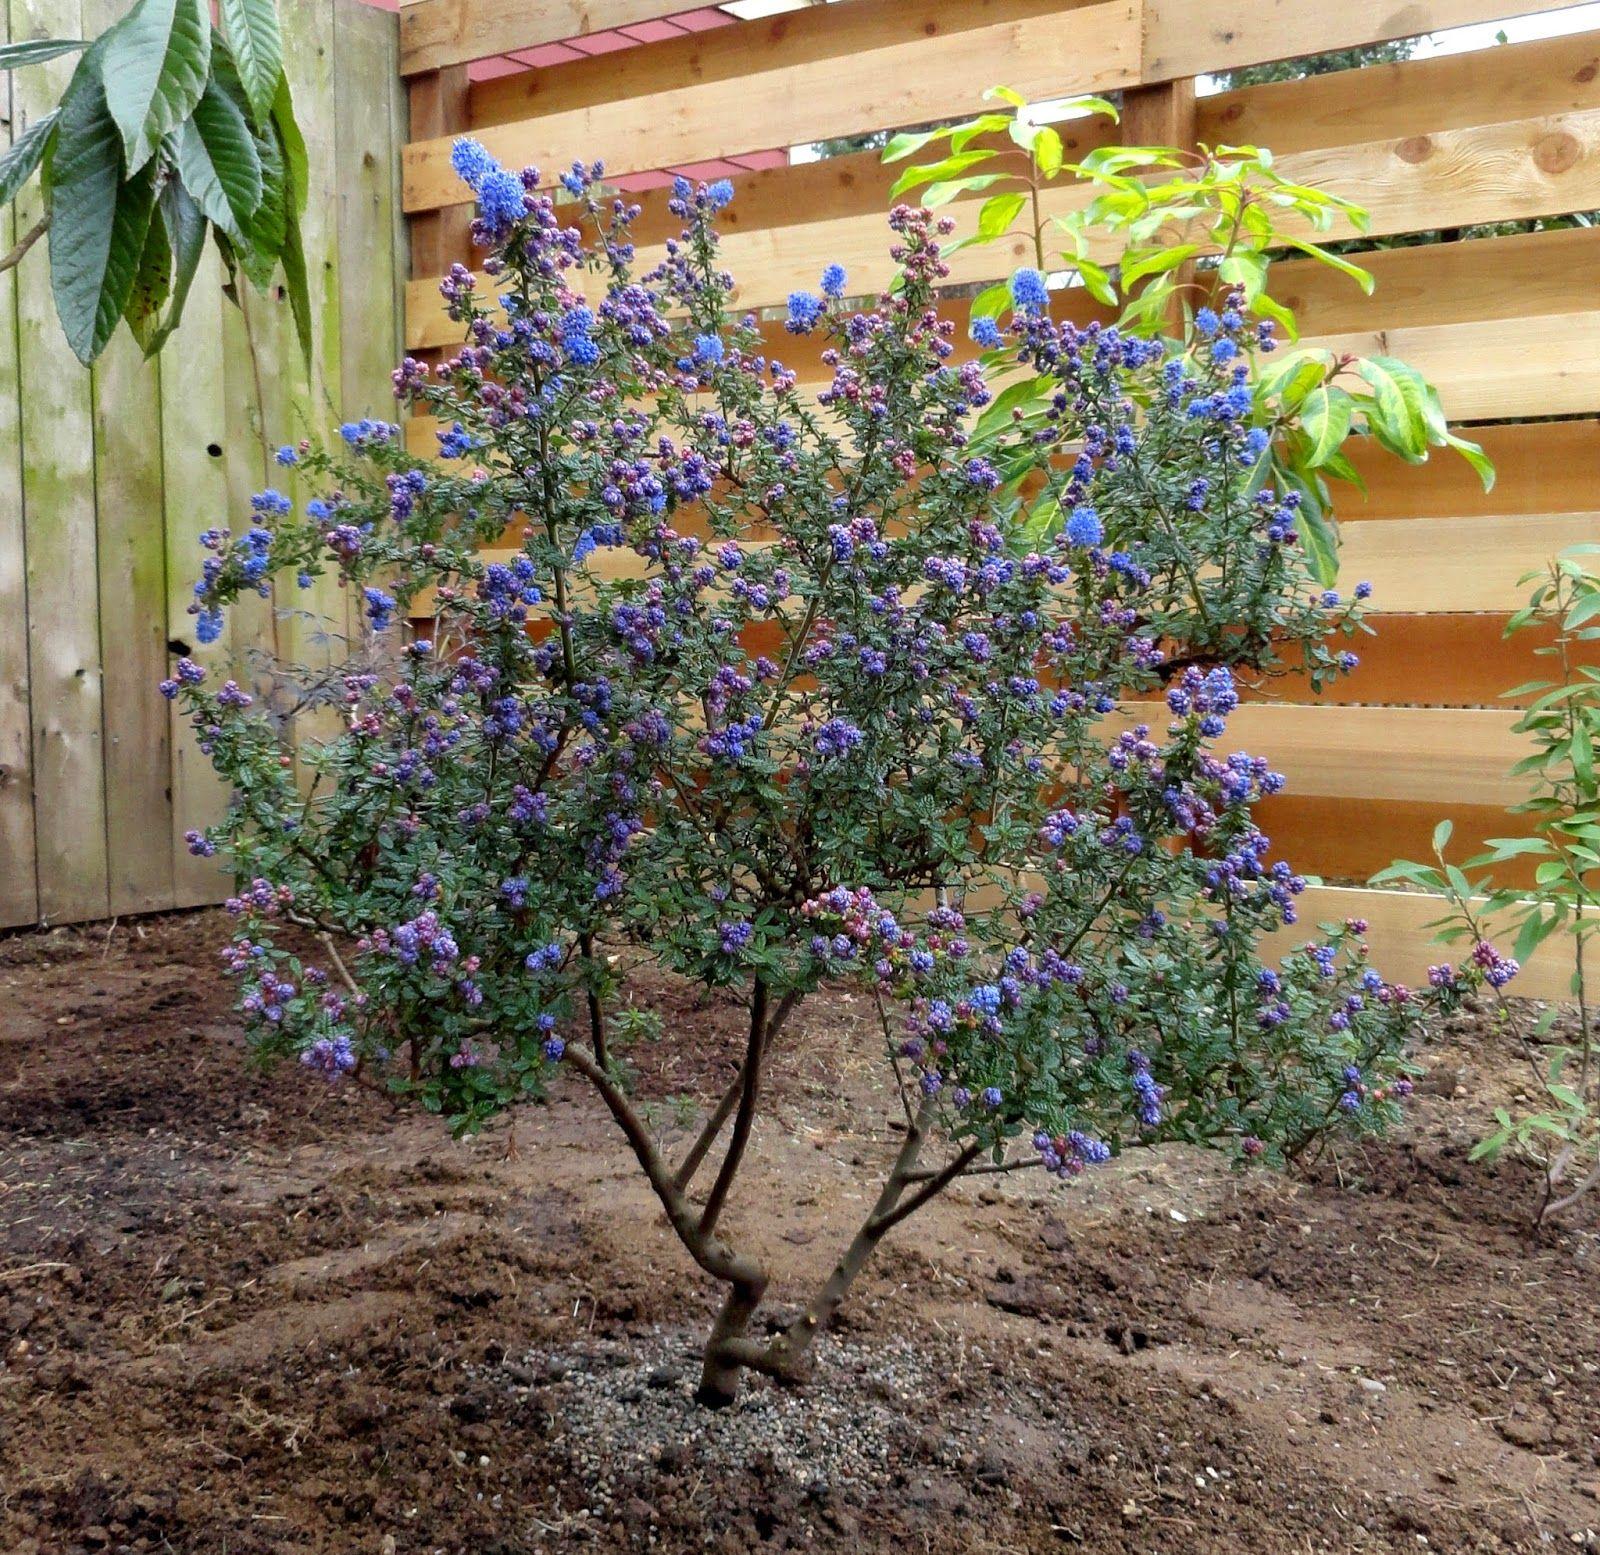 Danger Garden Drought Tolerant Trees Drought Tolerant Shrubs Drought Tolerant Plants California